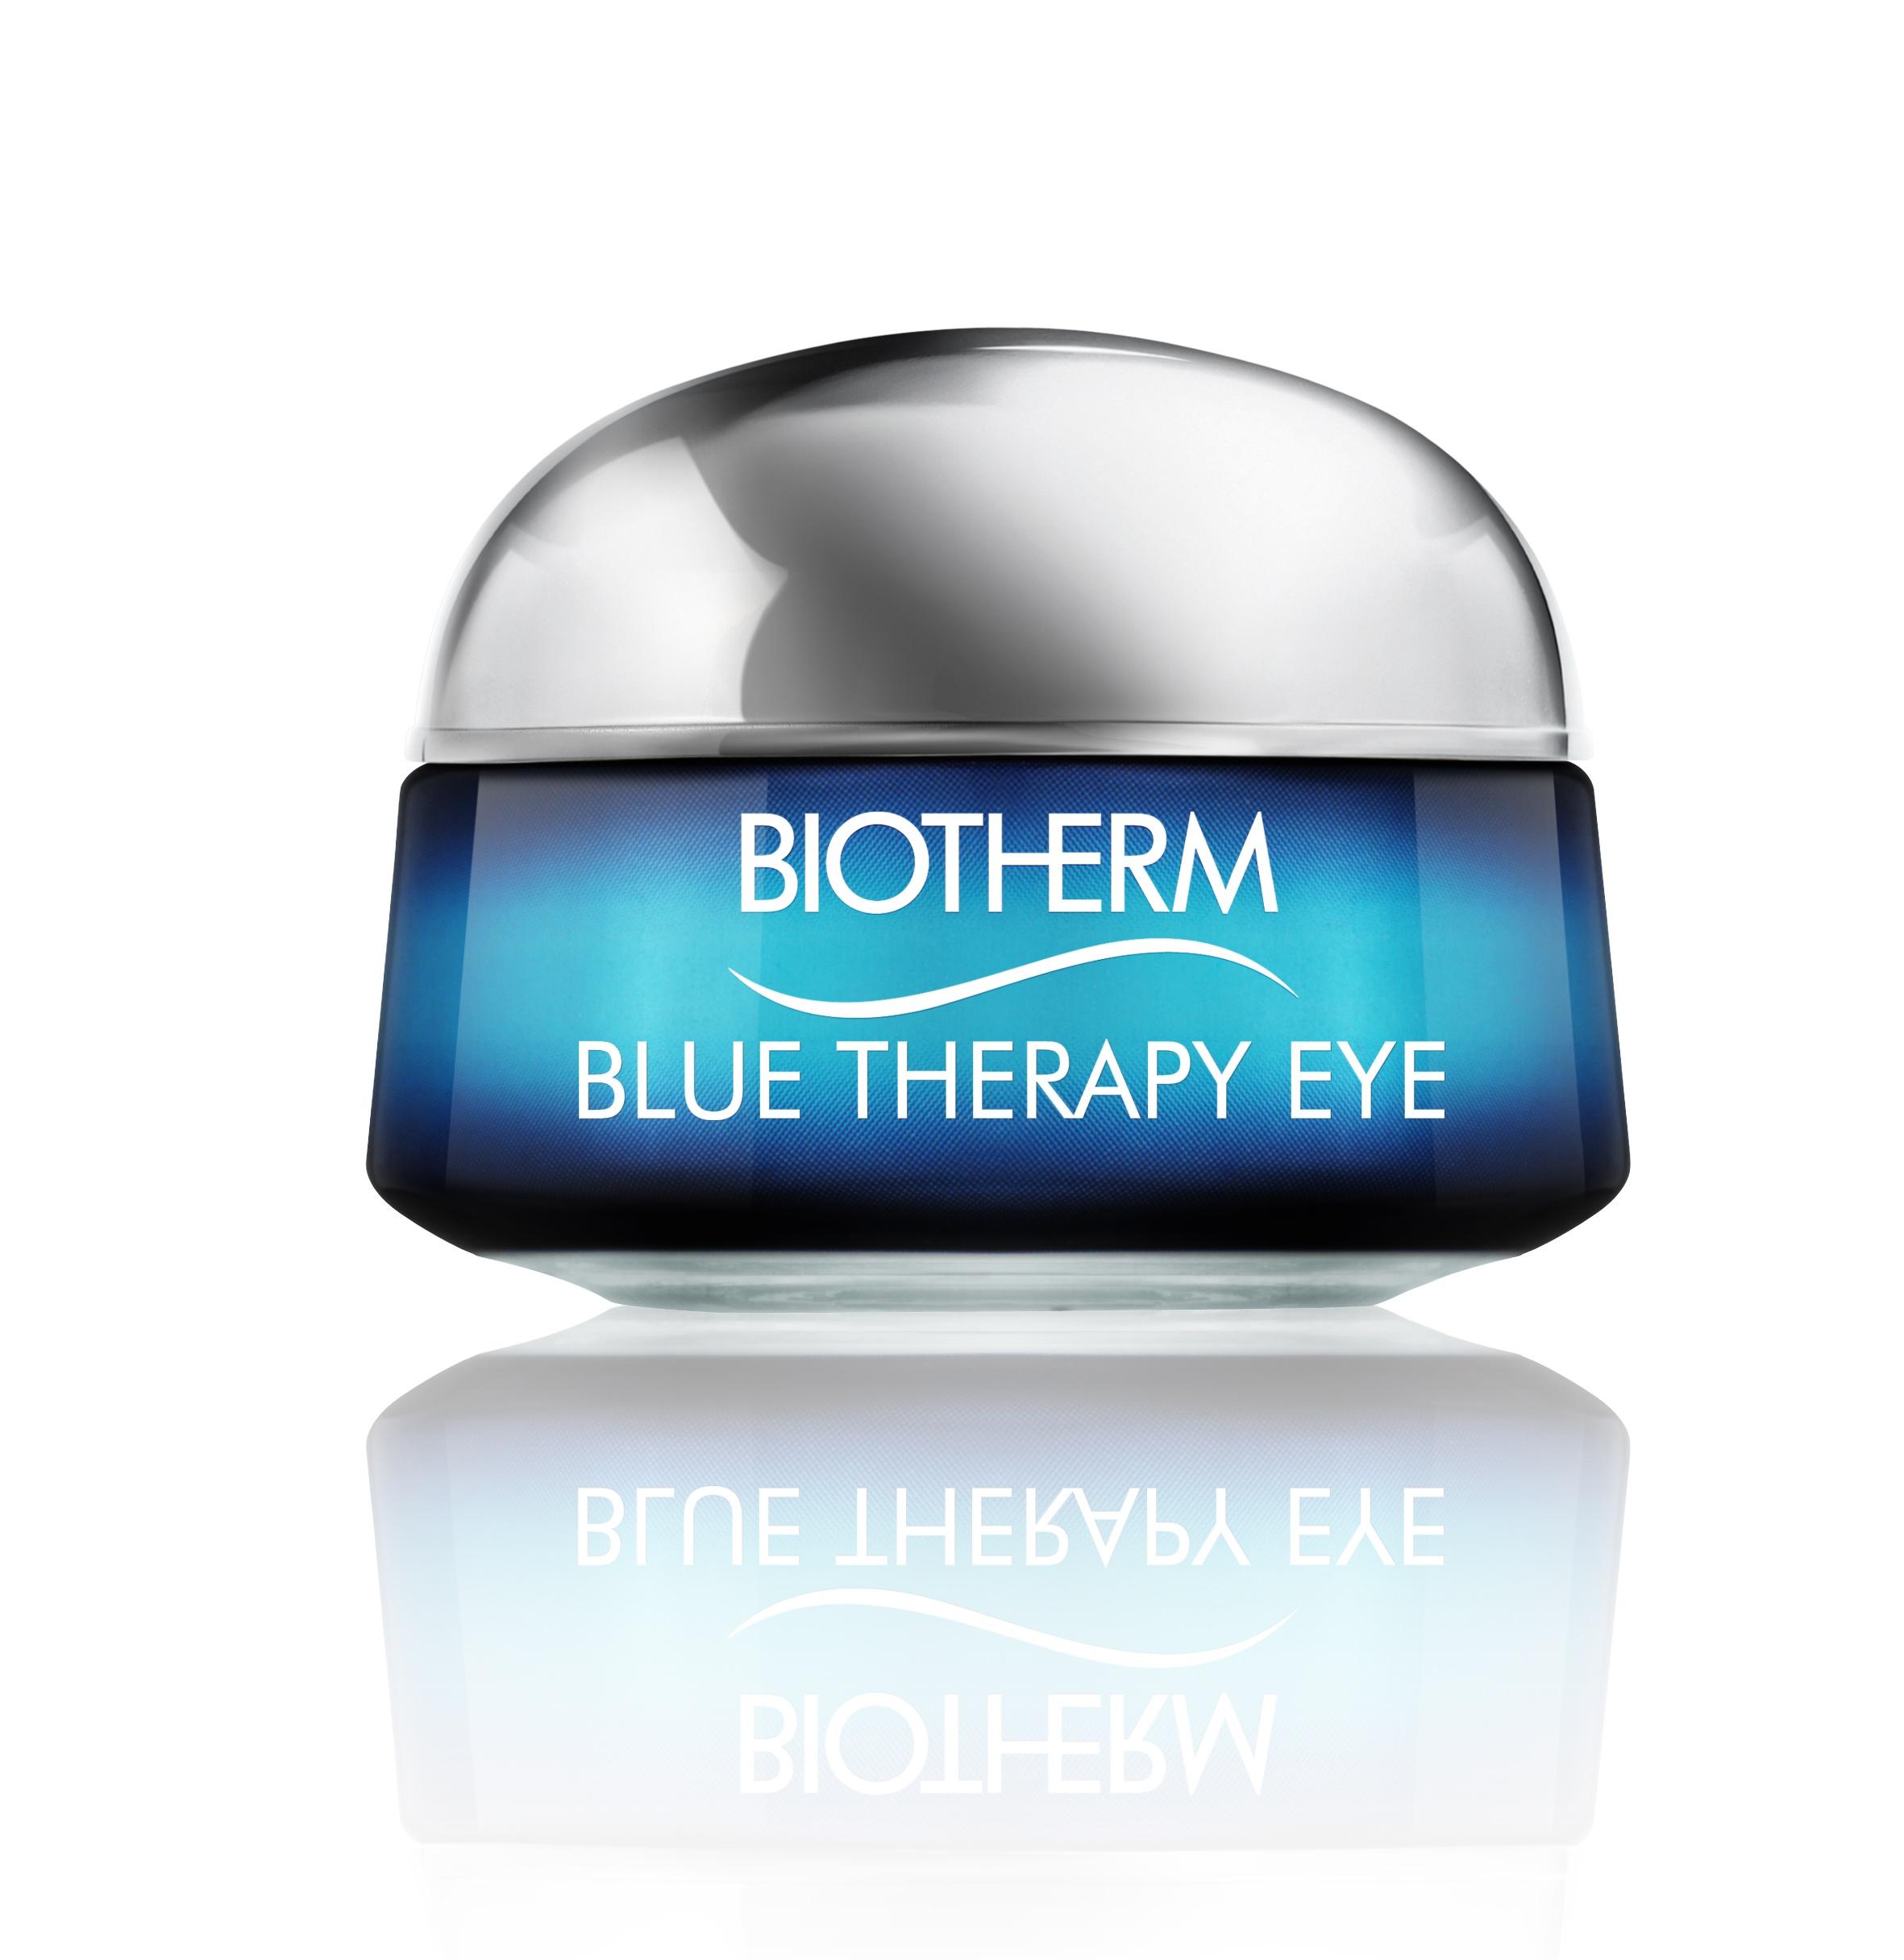 Biotherm Blue Therapy Eye, 15 ml